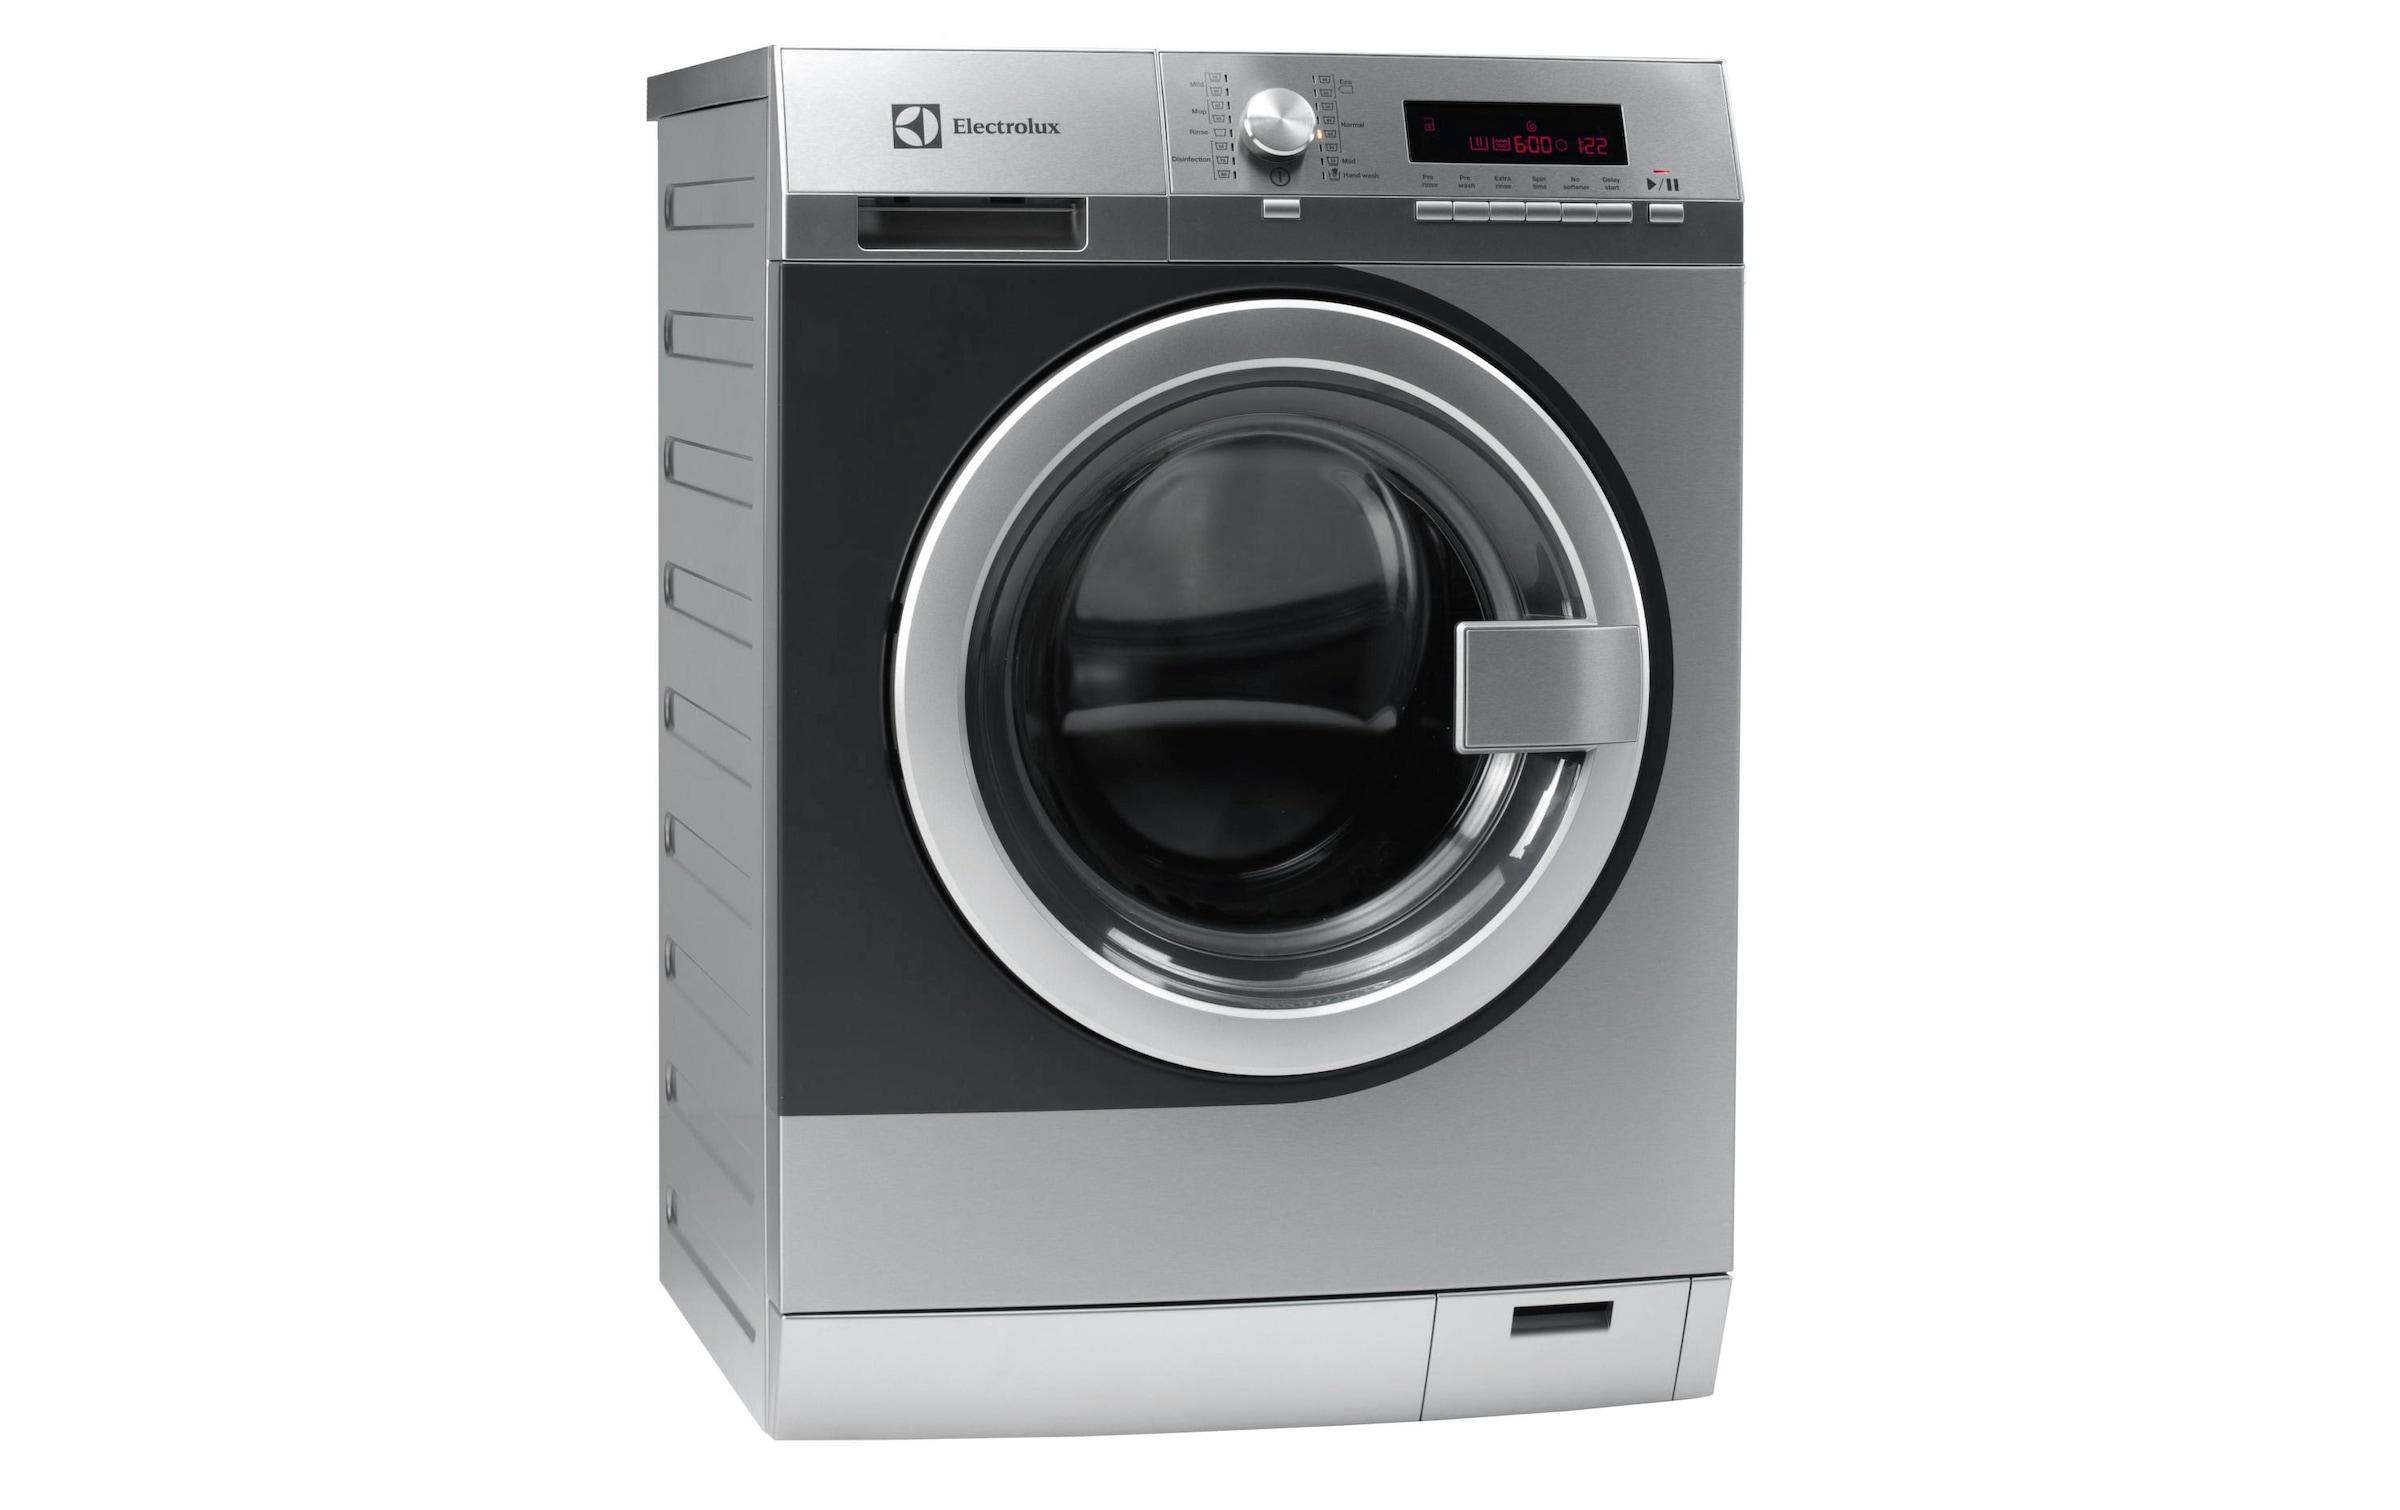 Image of AEG Electrolux Waschmaschine, WE 170 Ü